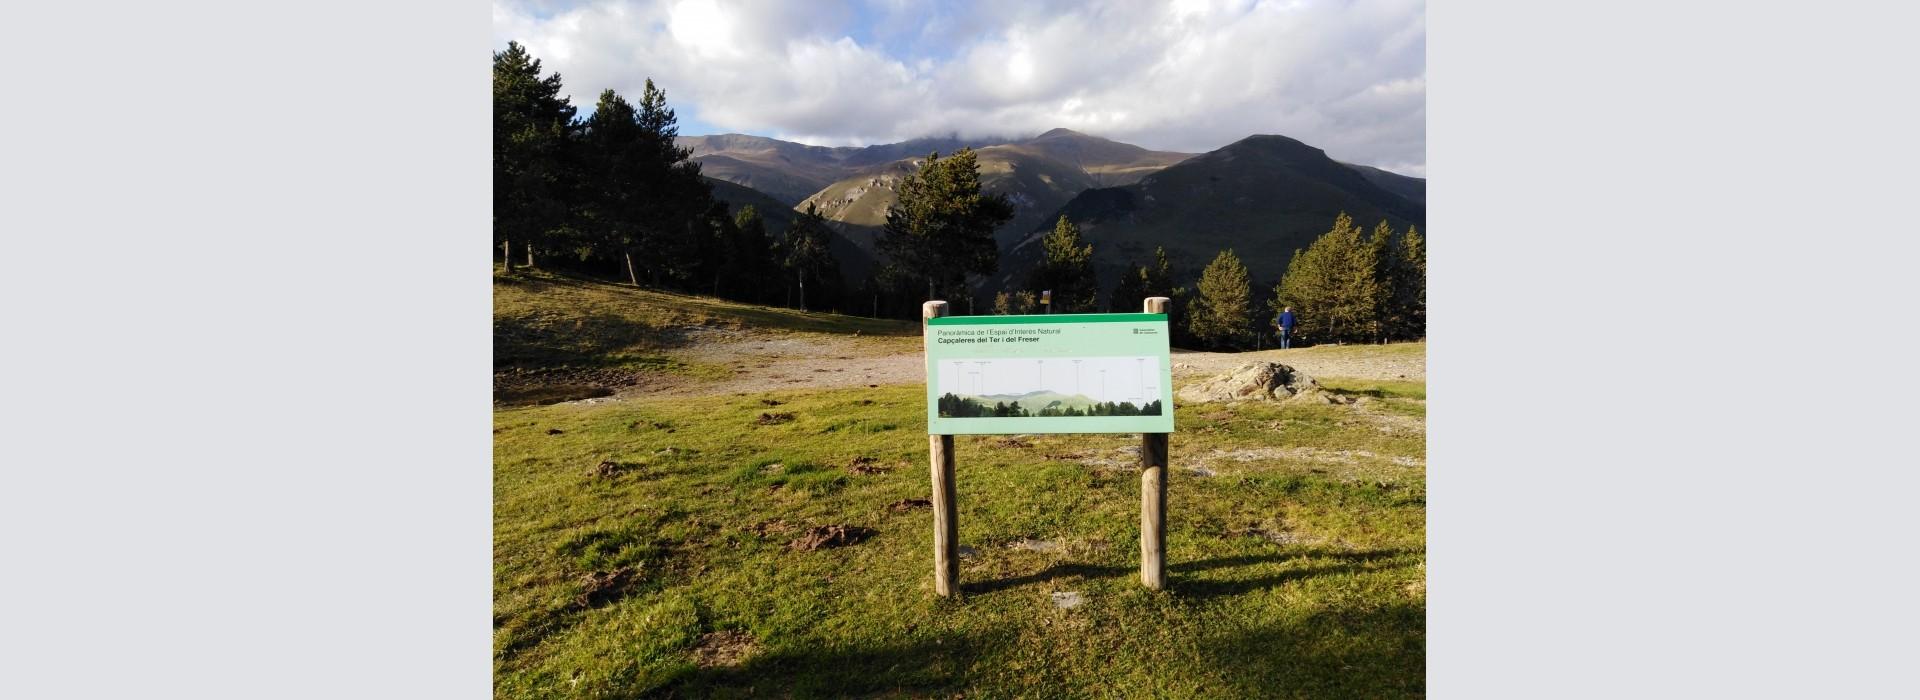 "Salida del GMC a la mina ""Zaragoza"" (Queralbs) y a las escombreras de las minas del collet de les Barraques (Planoles), Vall de Ribes, Ripollès, Girona."